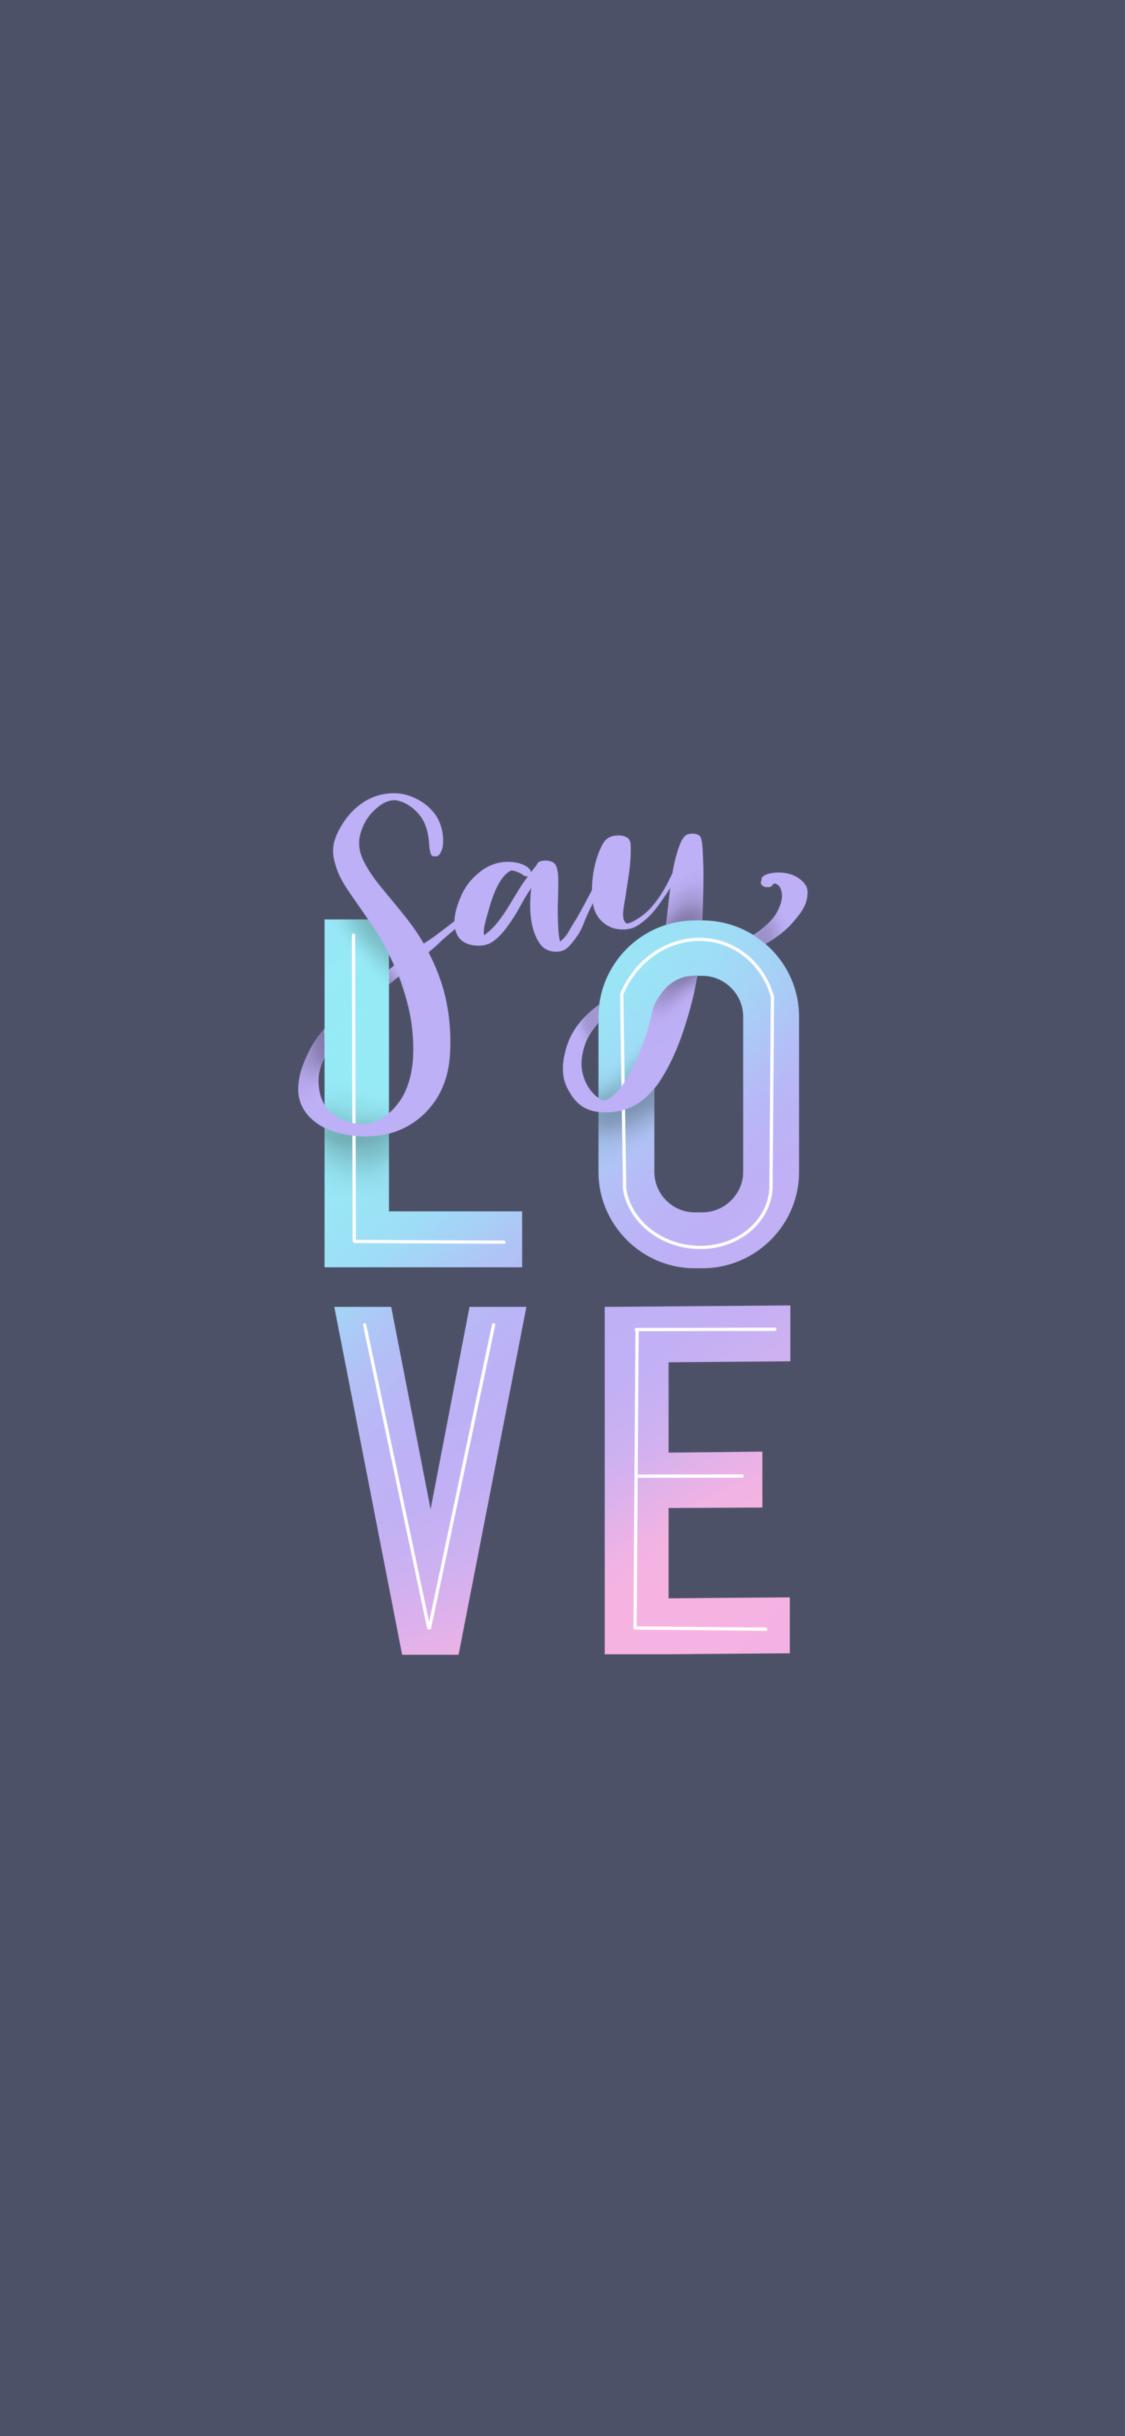 Free Iphone Mobile Wallpaper Everyone Say Love Pride Drag Race Lettering By Cbestdesigns Cute Wallpaper For Phone Free Phone Wallpaper Free Iphone Wallpaper